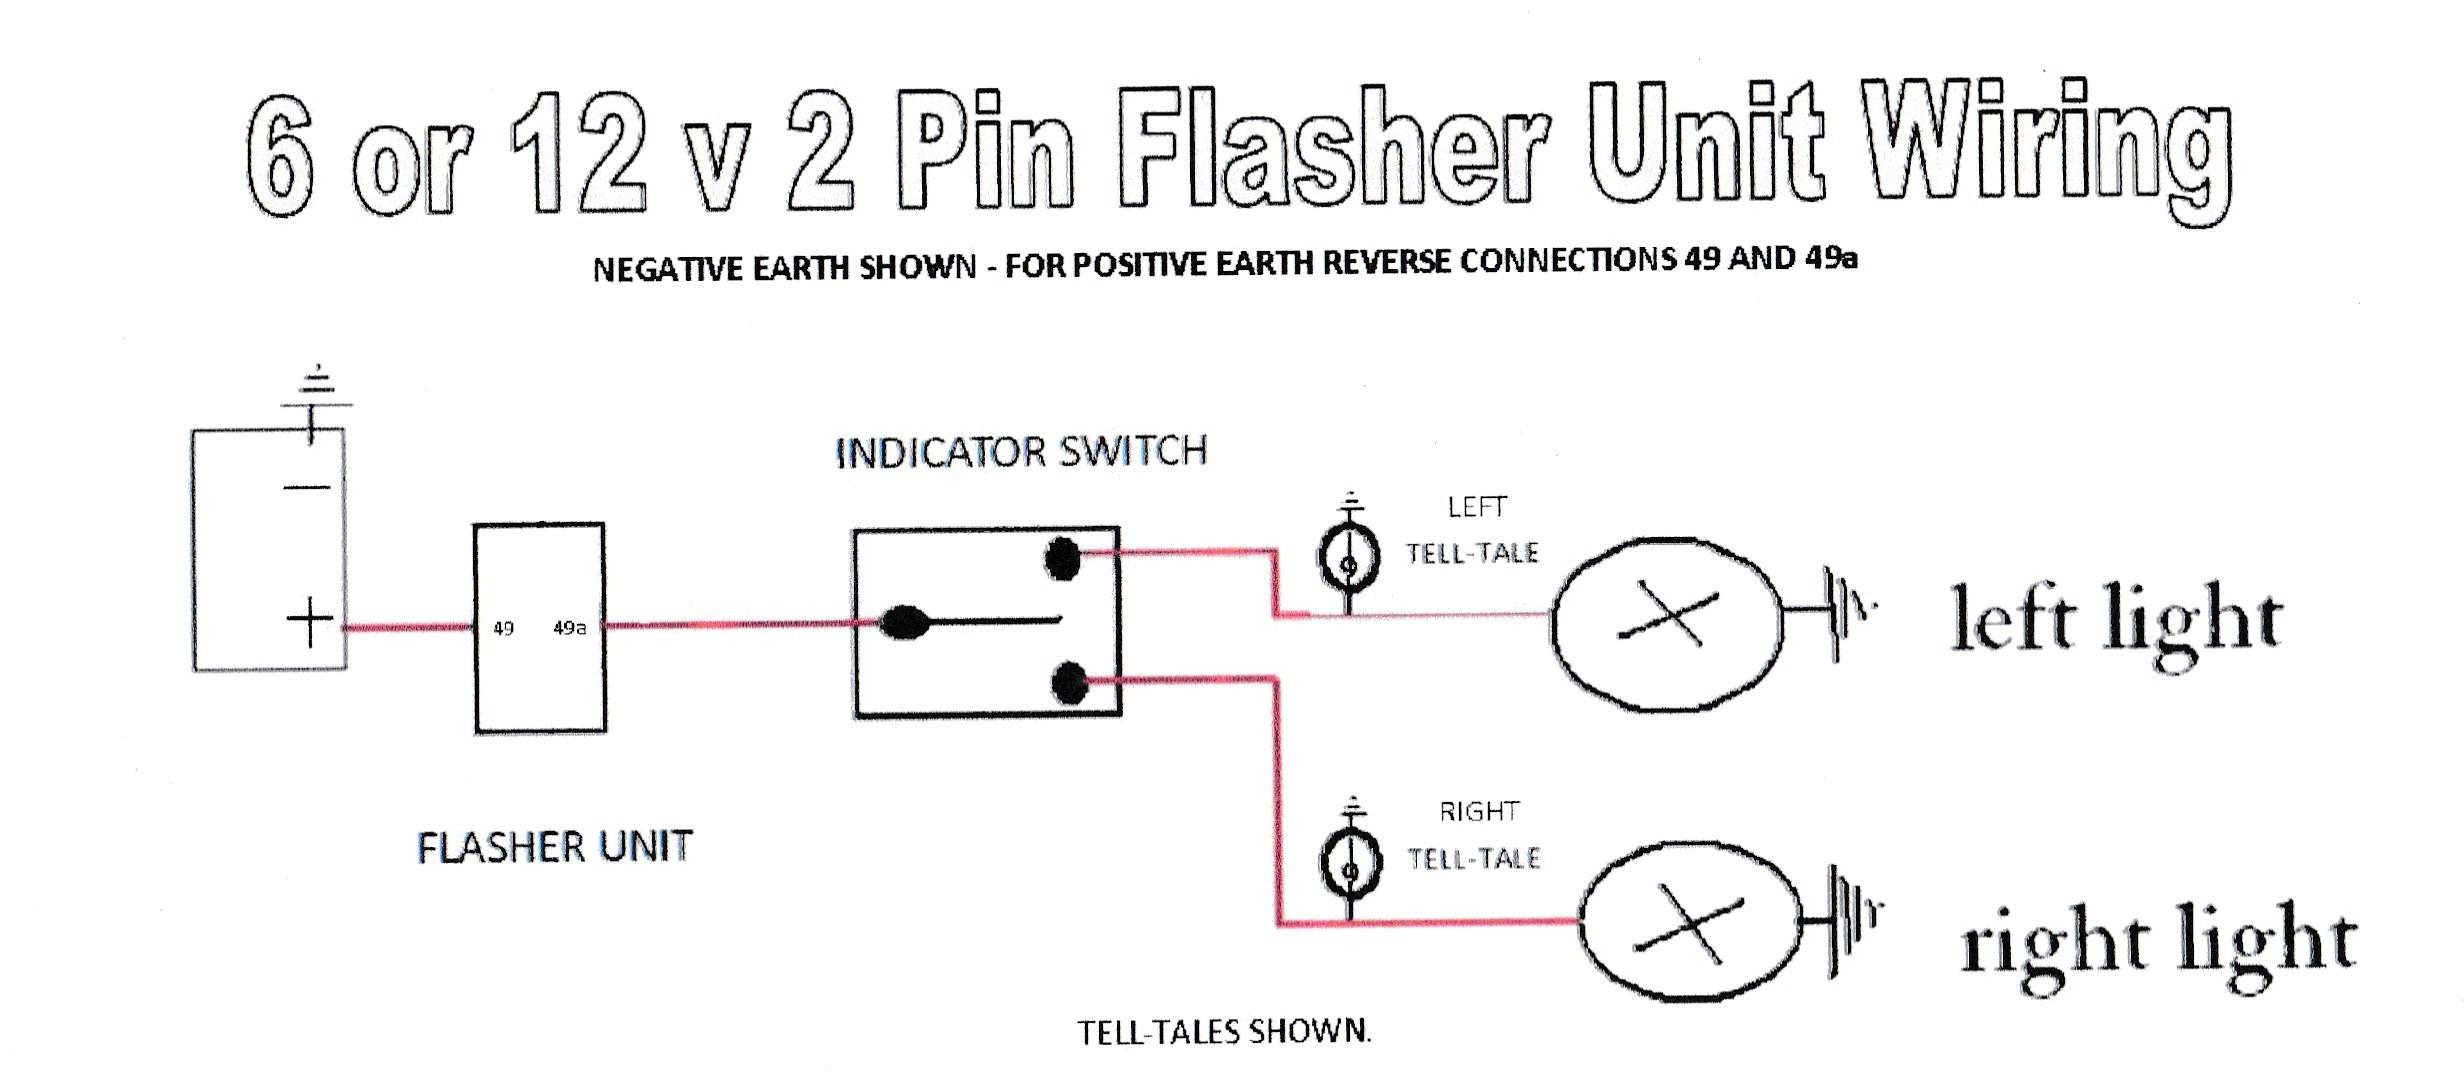 2 Pin Flasher Vs 3 Pin Flasher Vanagon Wiring Diagram Blinker Full Hd Version Diagram Of 2 Pin Flasher Vs 3 Pin Flasher